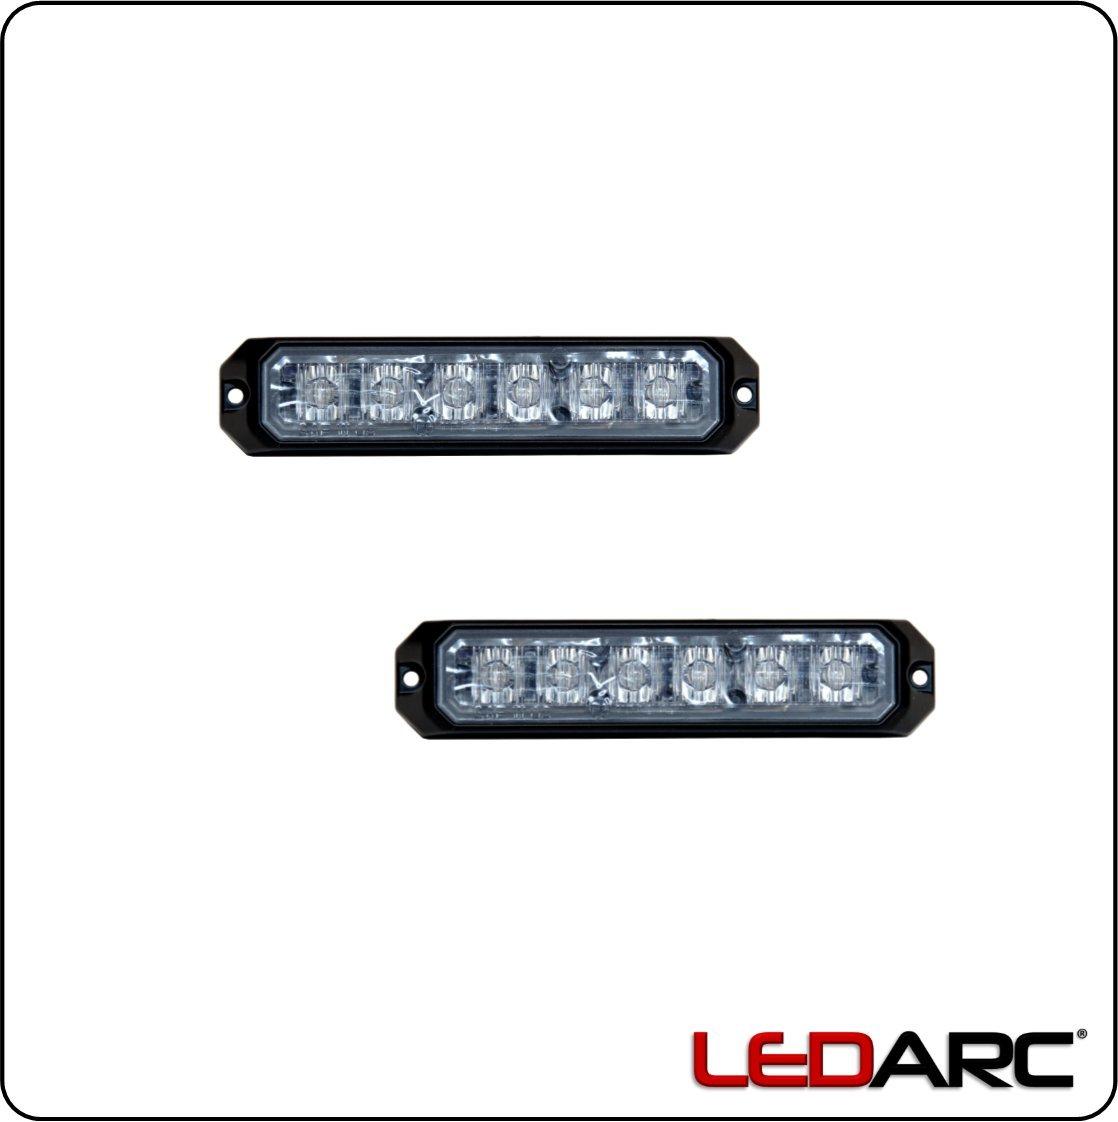 Frontwarner Stra/ßenr/äumer Axixtech MS6 LED Frontblitzer Set blau ECE-R65 Frontwarnsystem